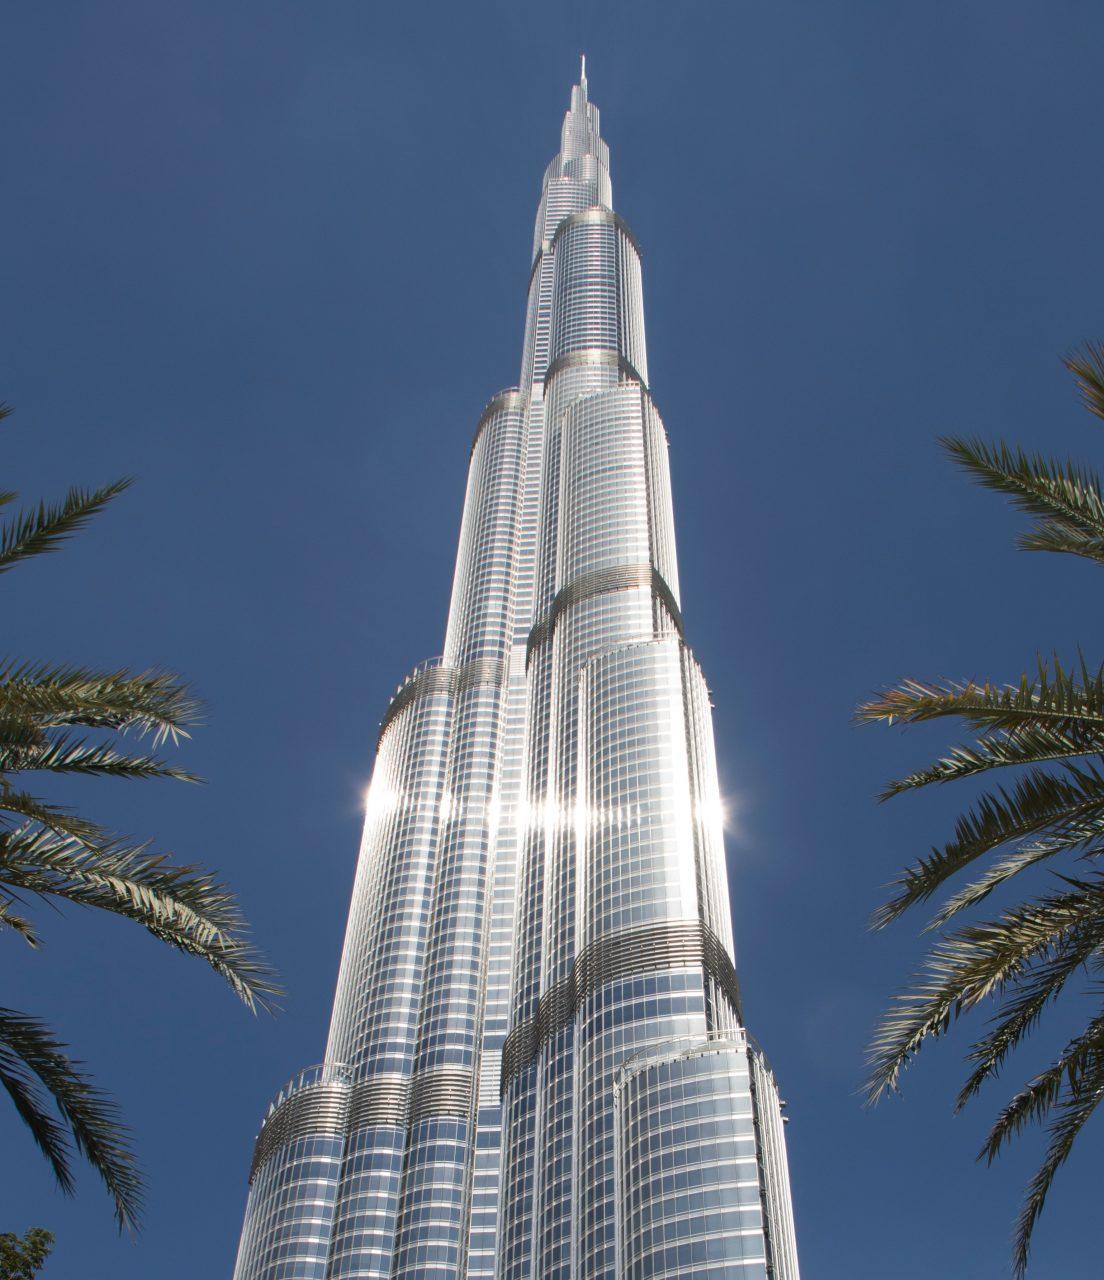 #BurjKaliFA building